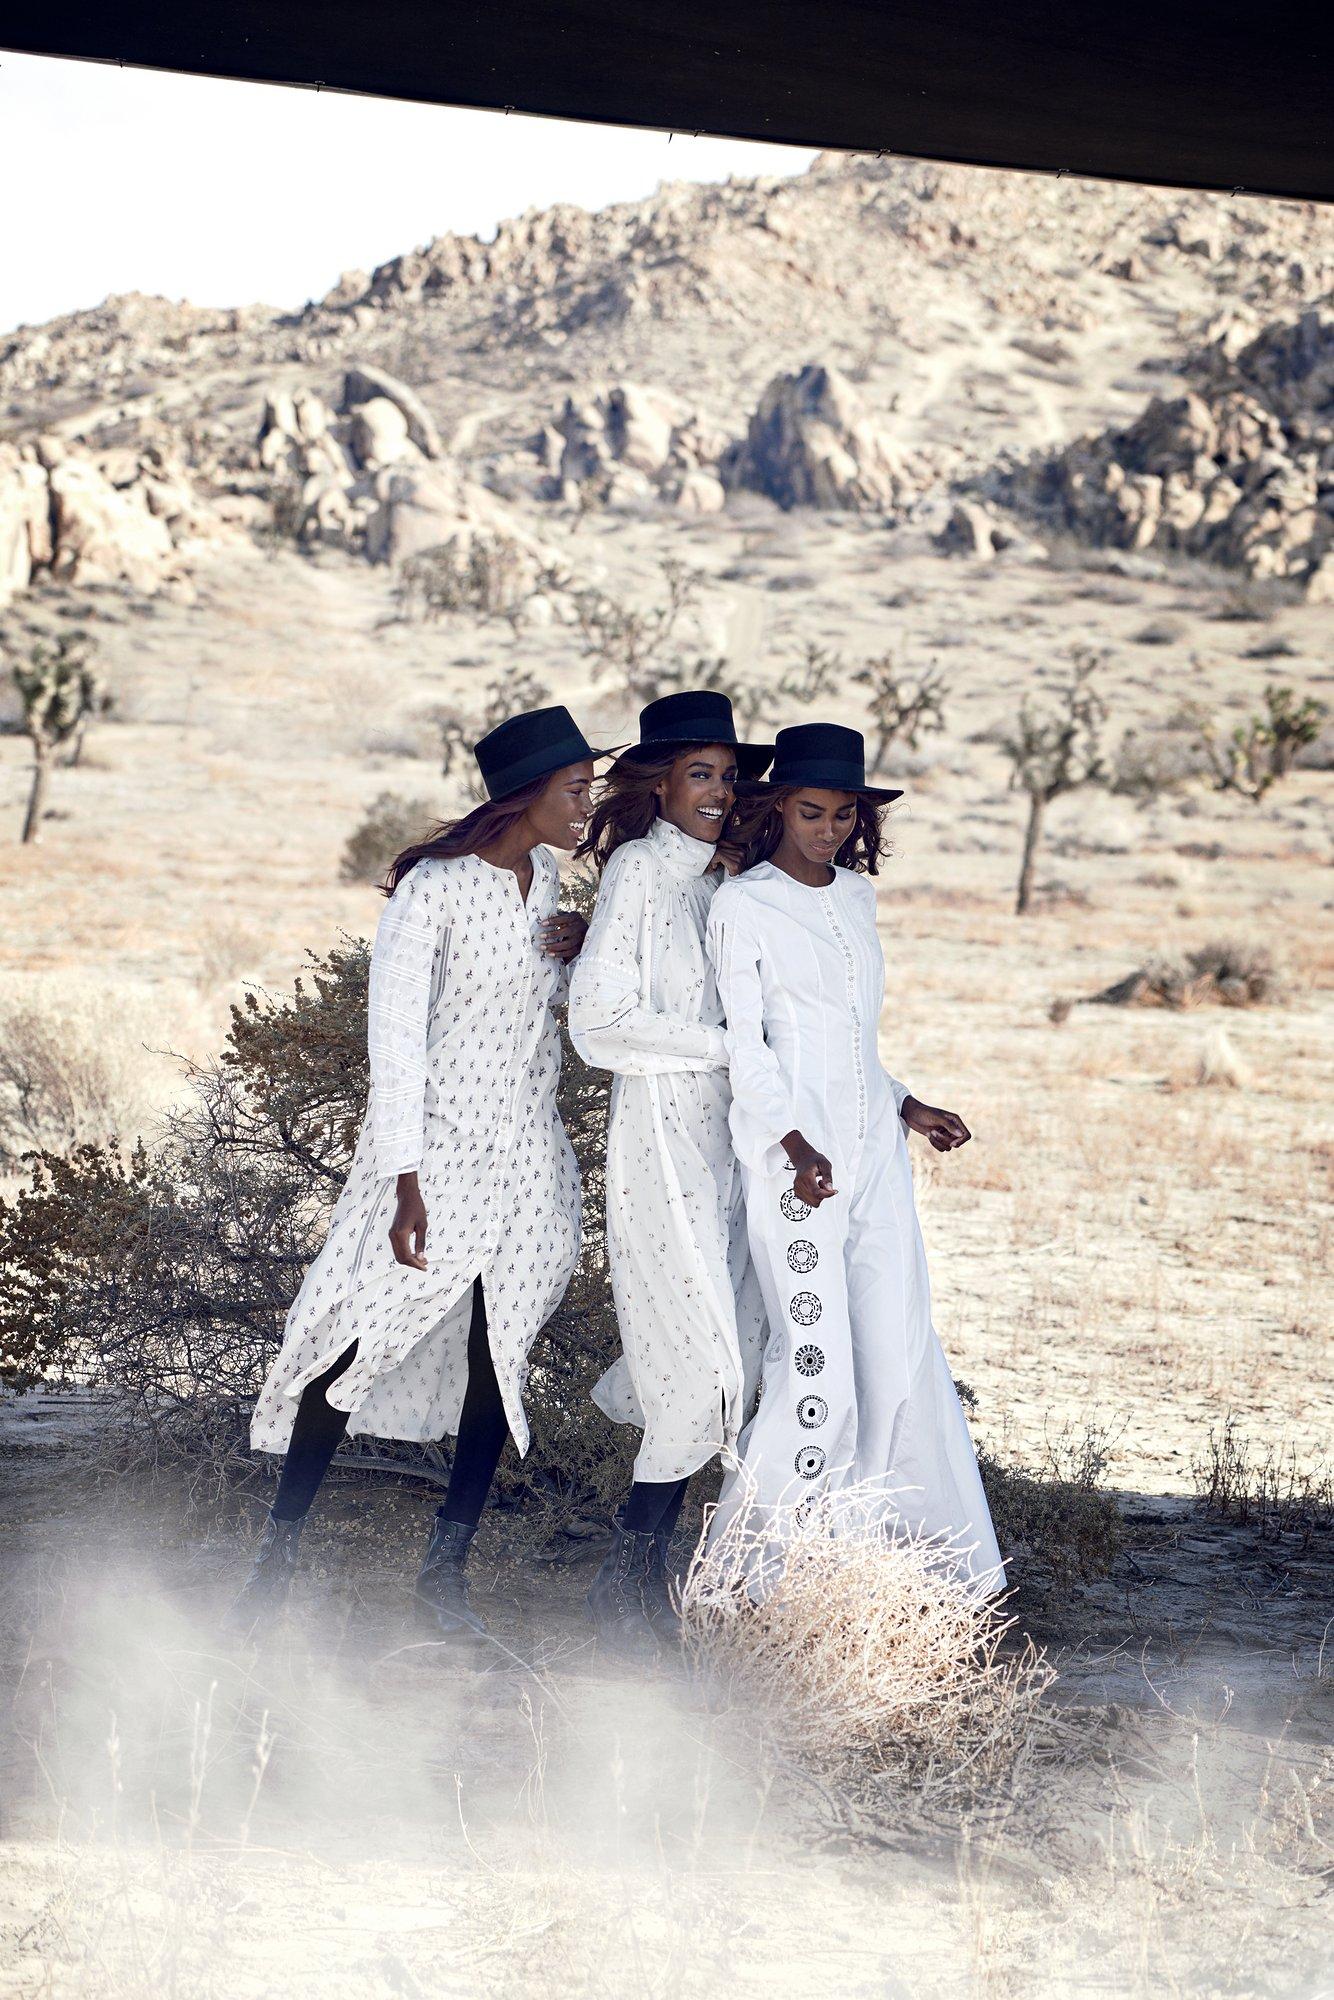 Kai Newman,Leila Nda,and Tami Williams,all in Christian Dior dresses